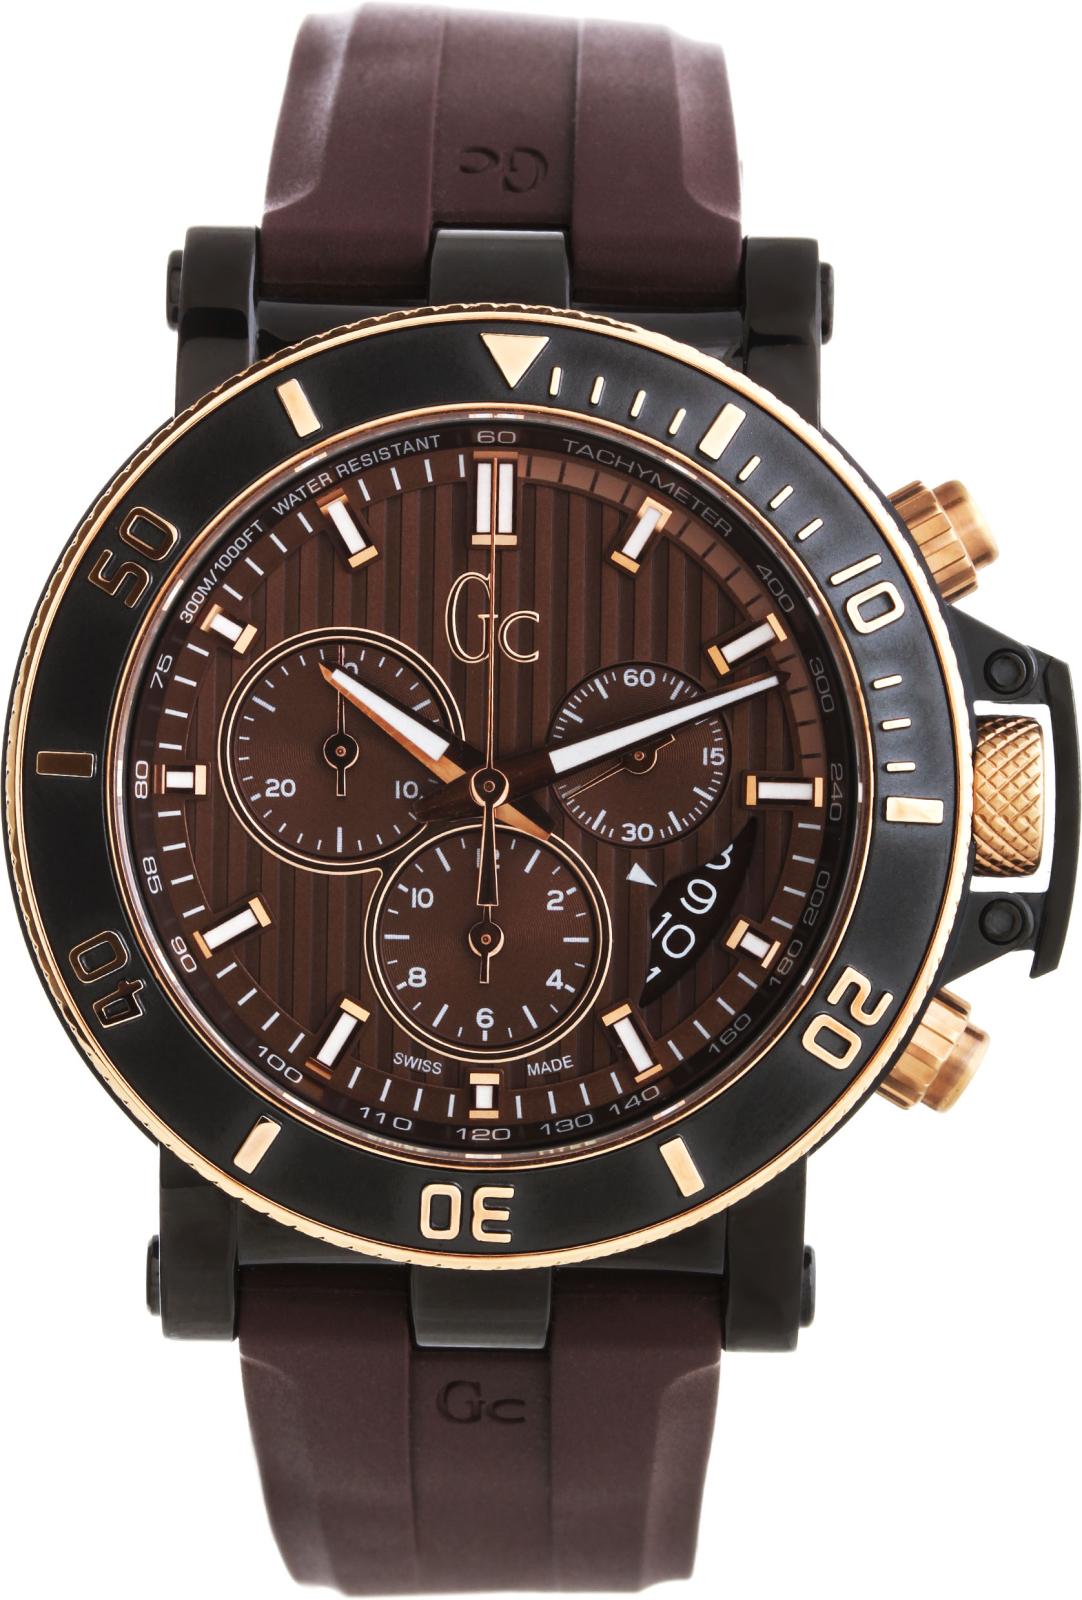 Часы швейцарские мужские gc